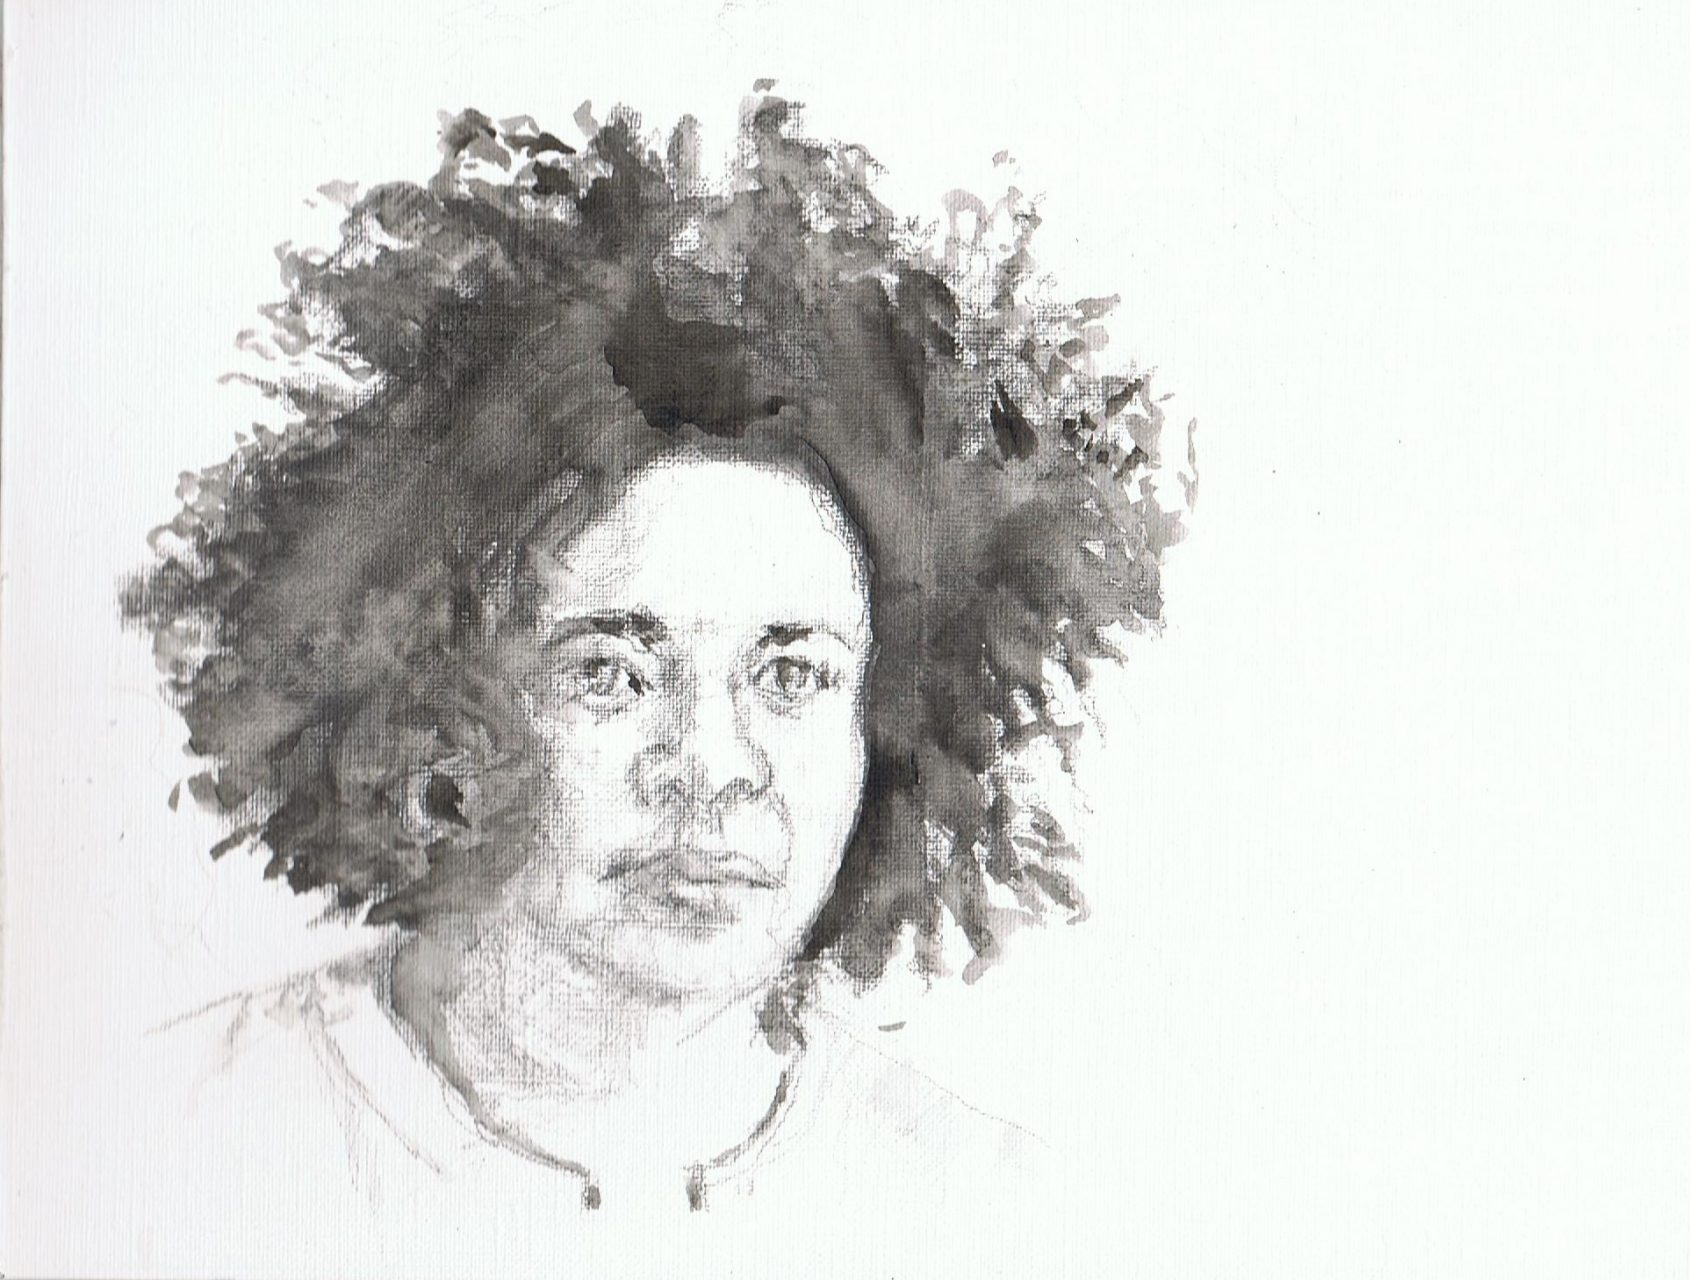 365 dagen een portret , dag 3 Tania Koss, operazangeres Aquarel op papier